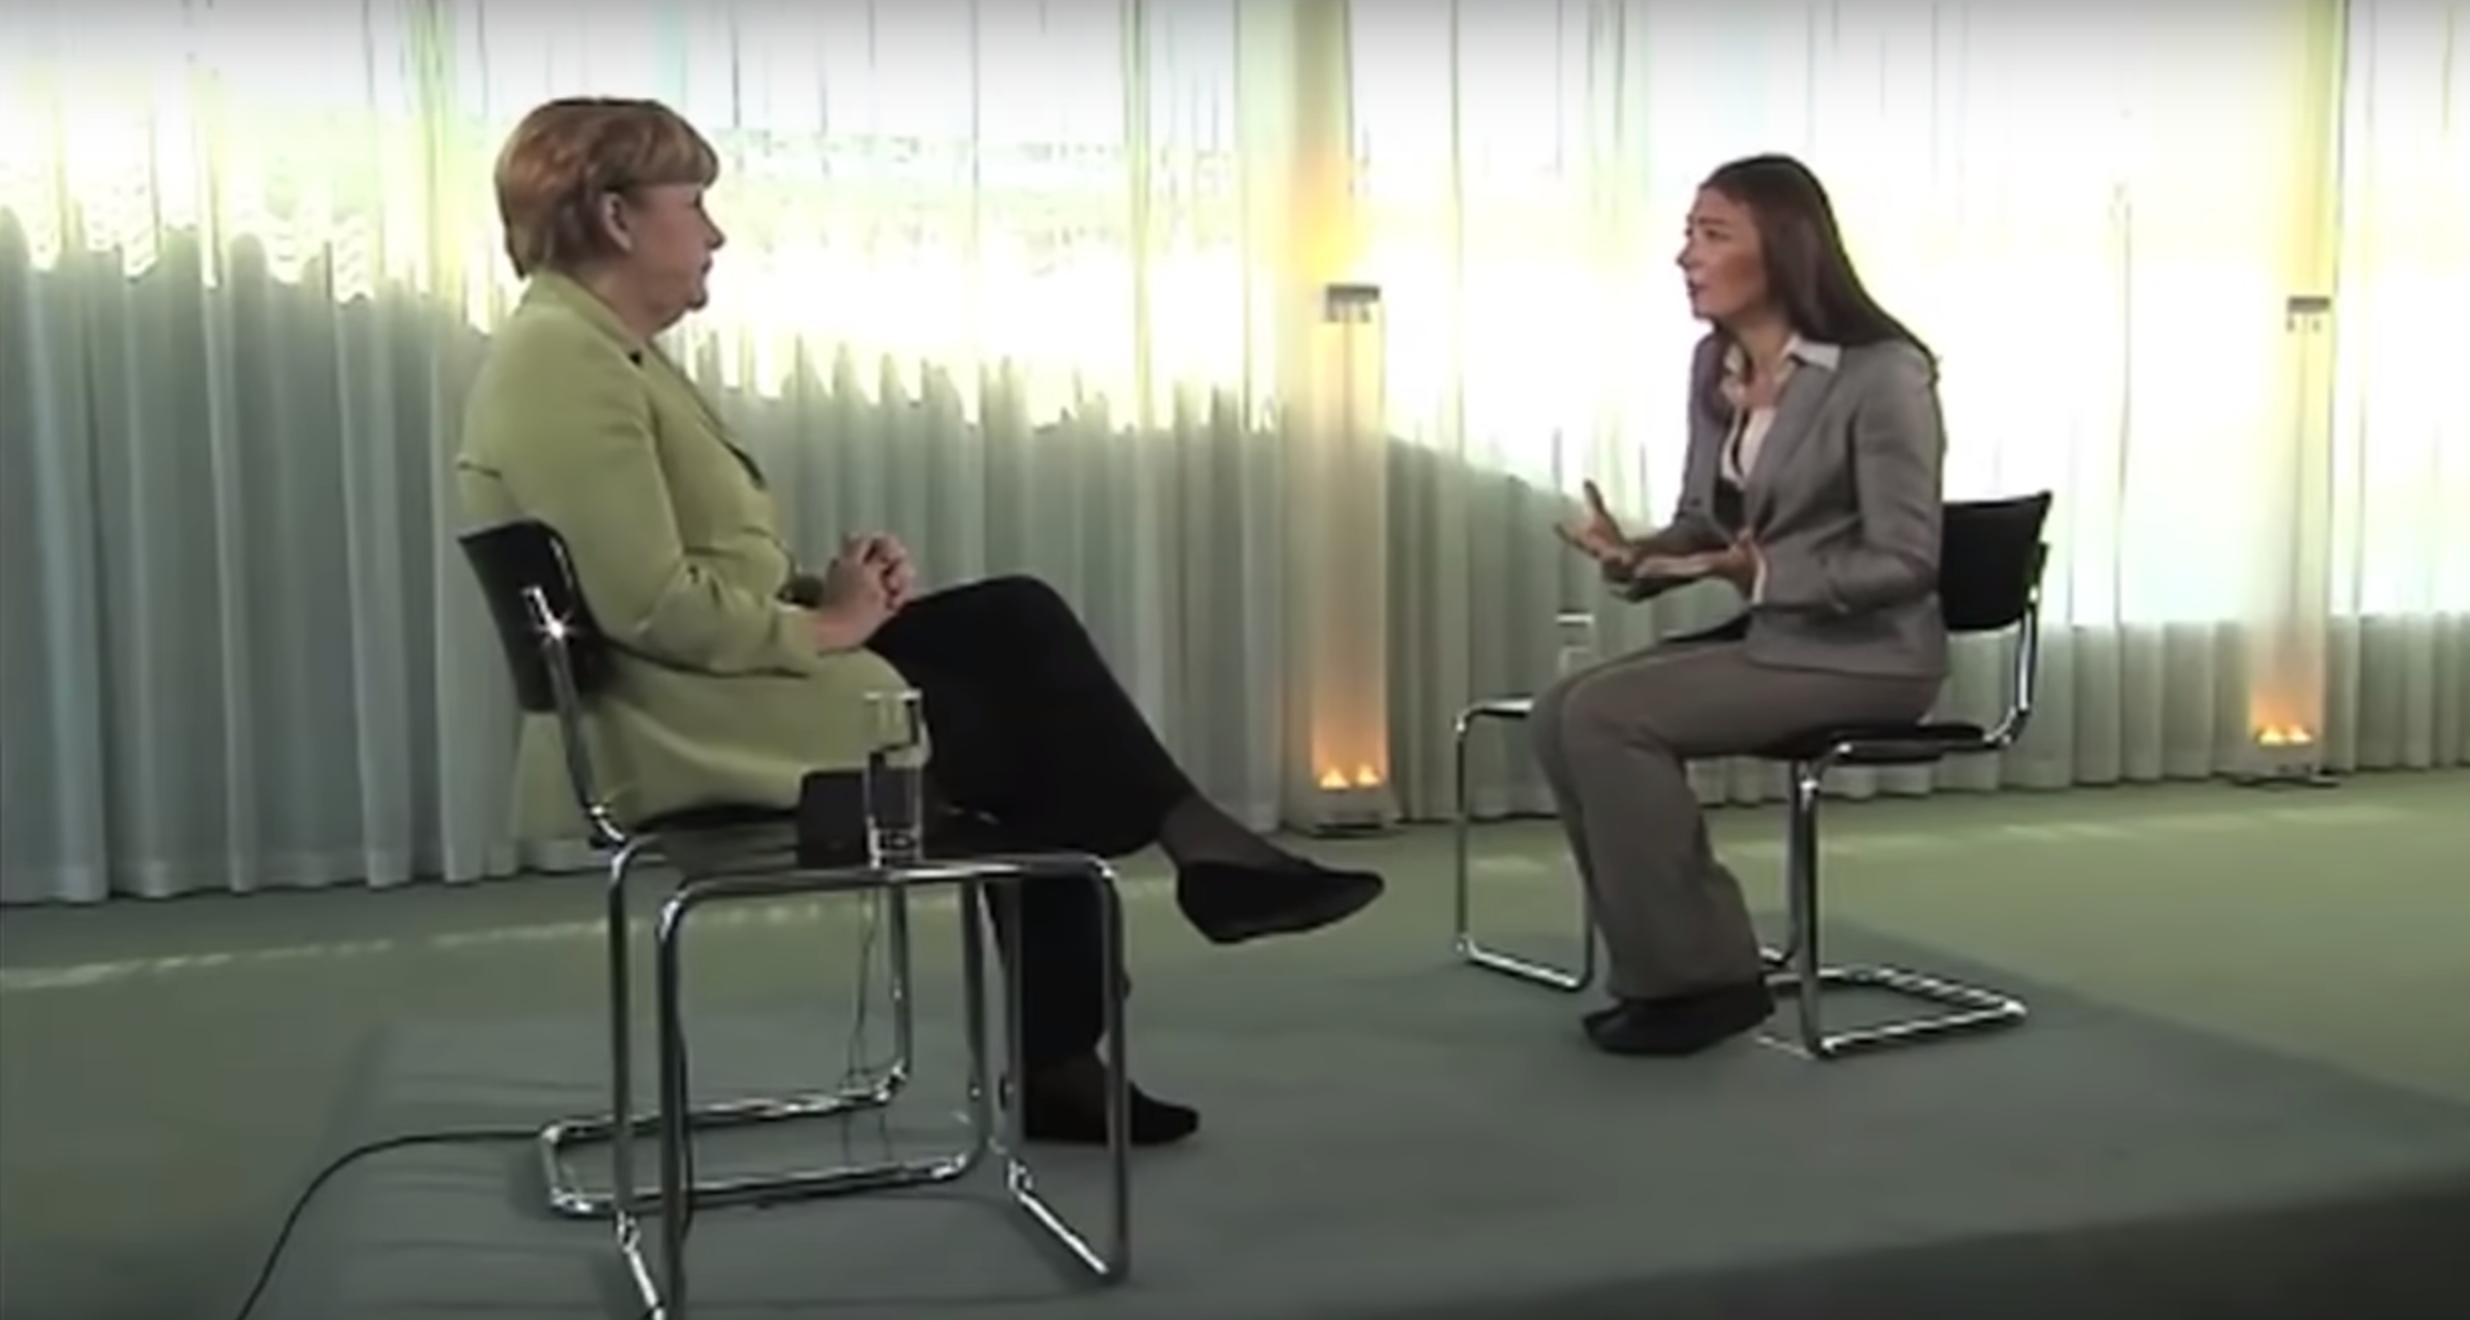 Angela Merkel in conversation with Katya Alder